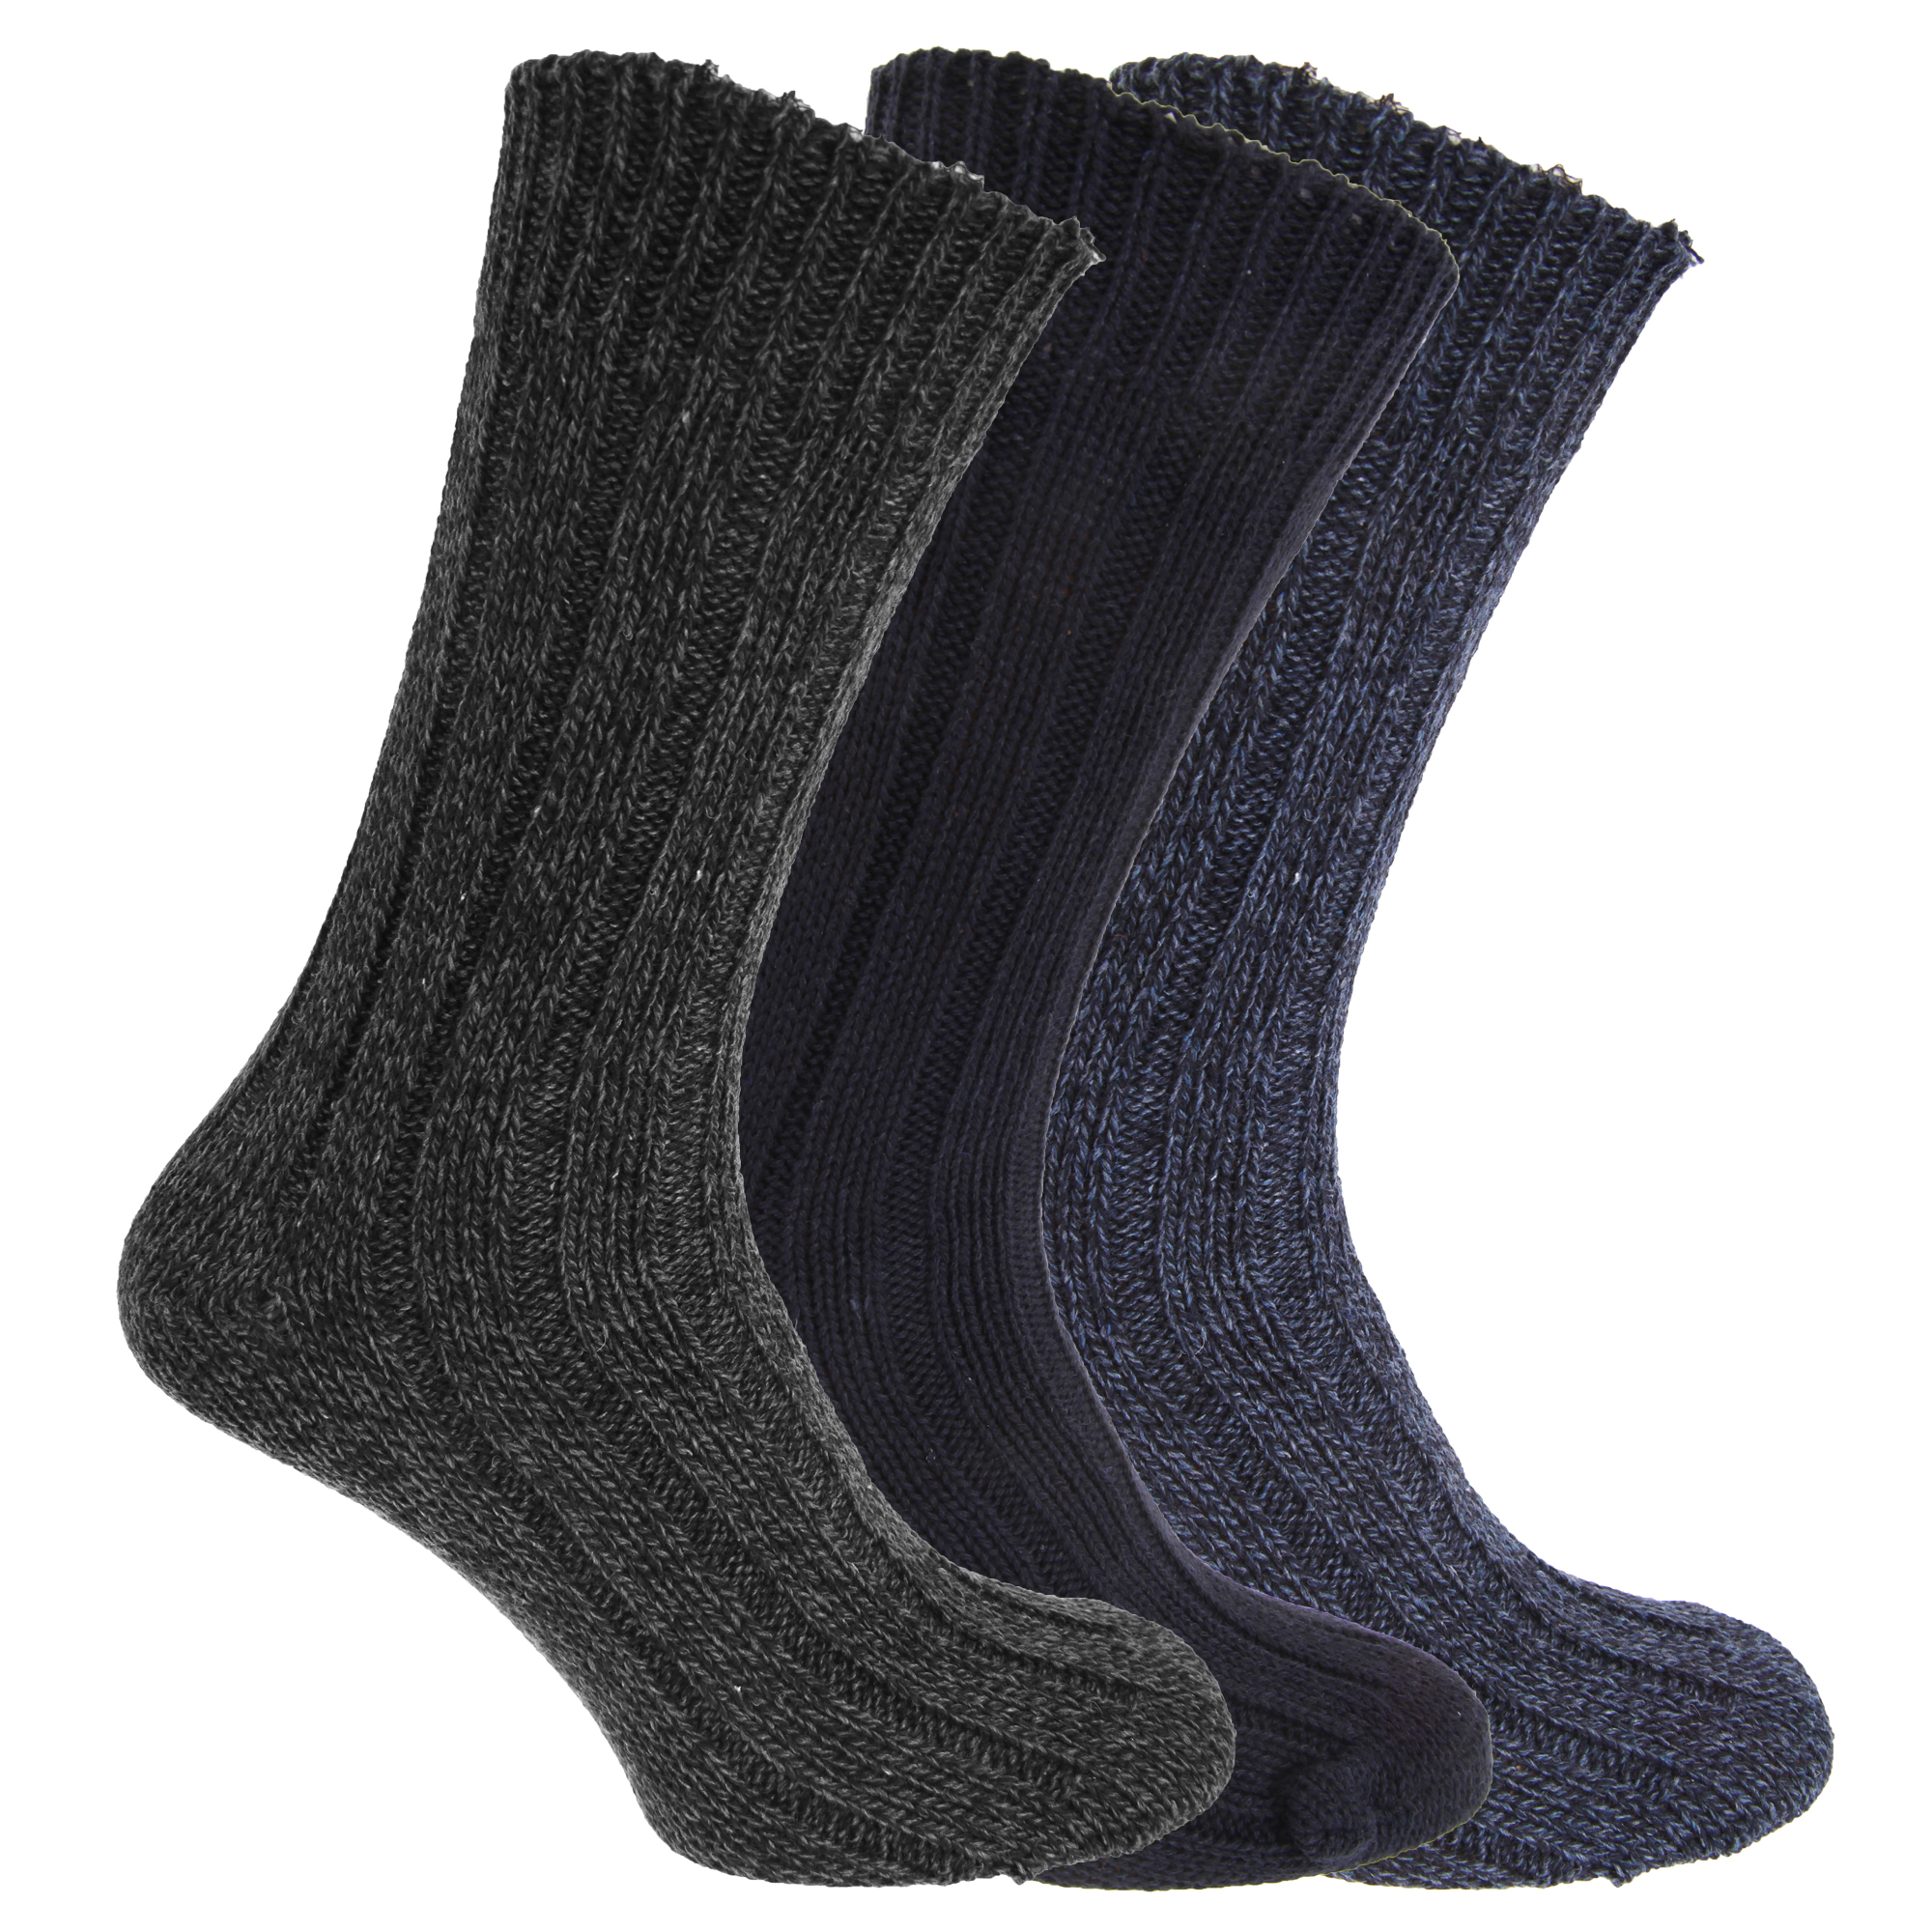 mens wool blend boot socks pack of 3 us 7 12